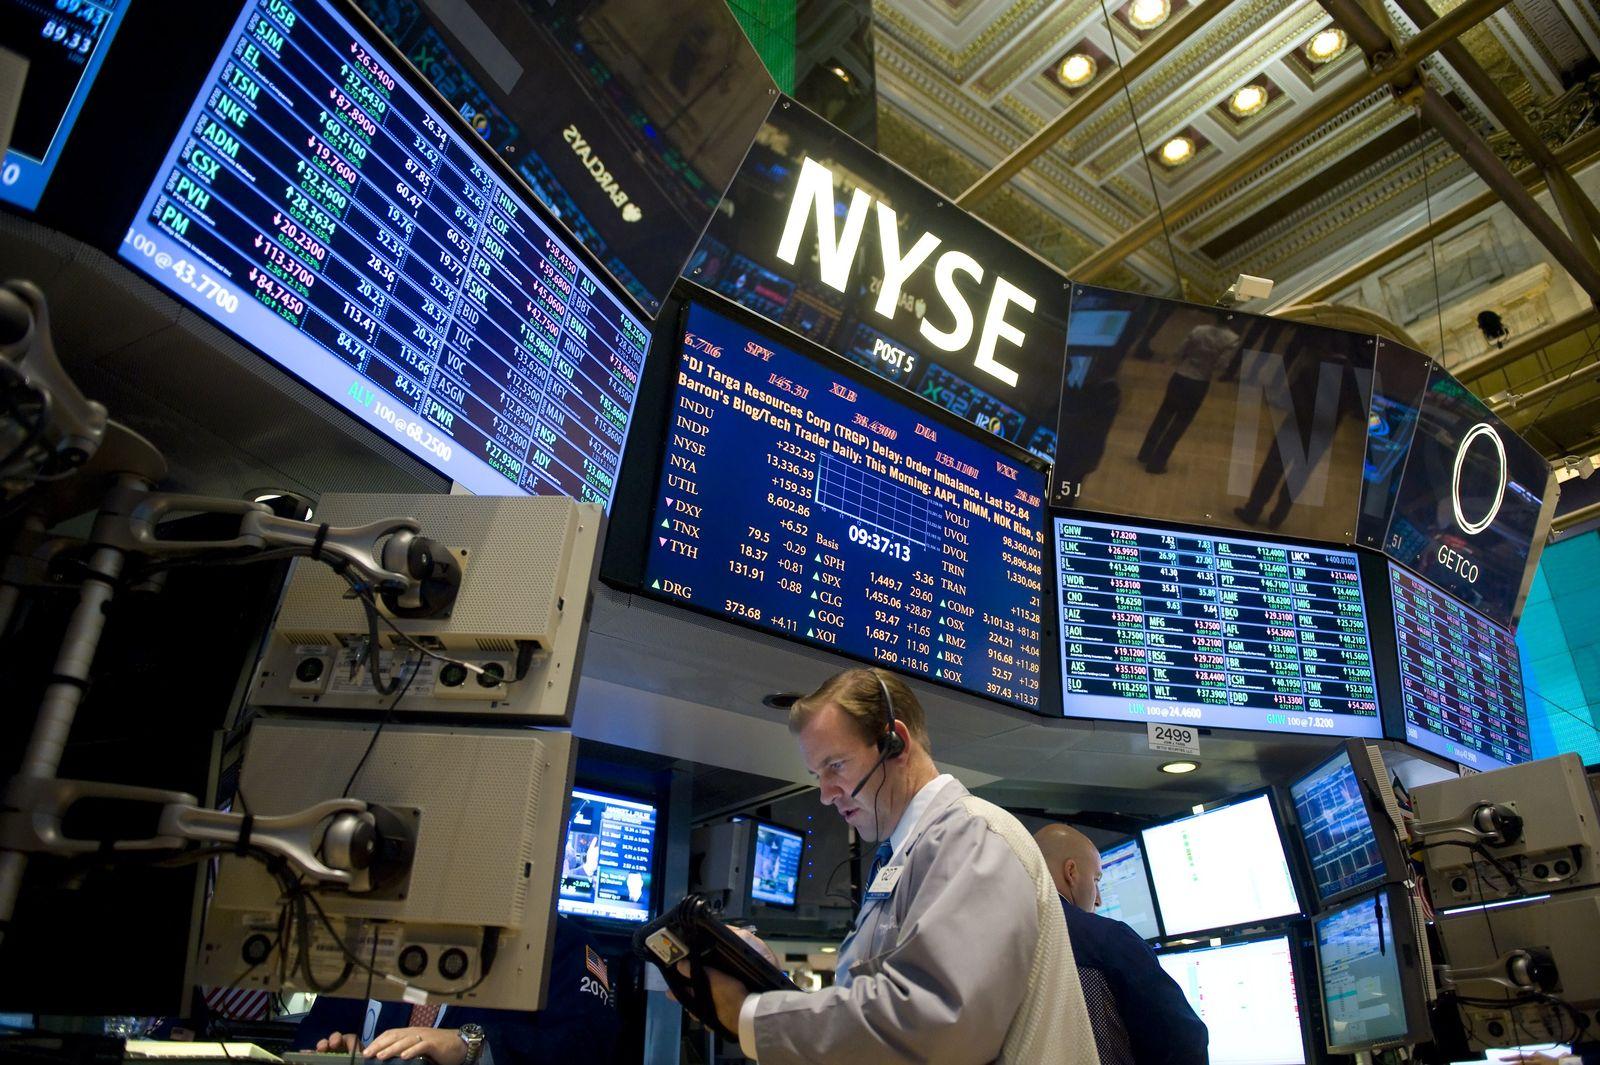 US / Ney Yorker Börse / Wall Street / NYSE